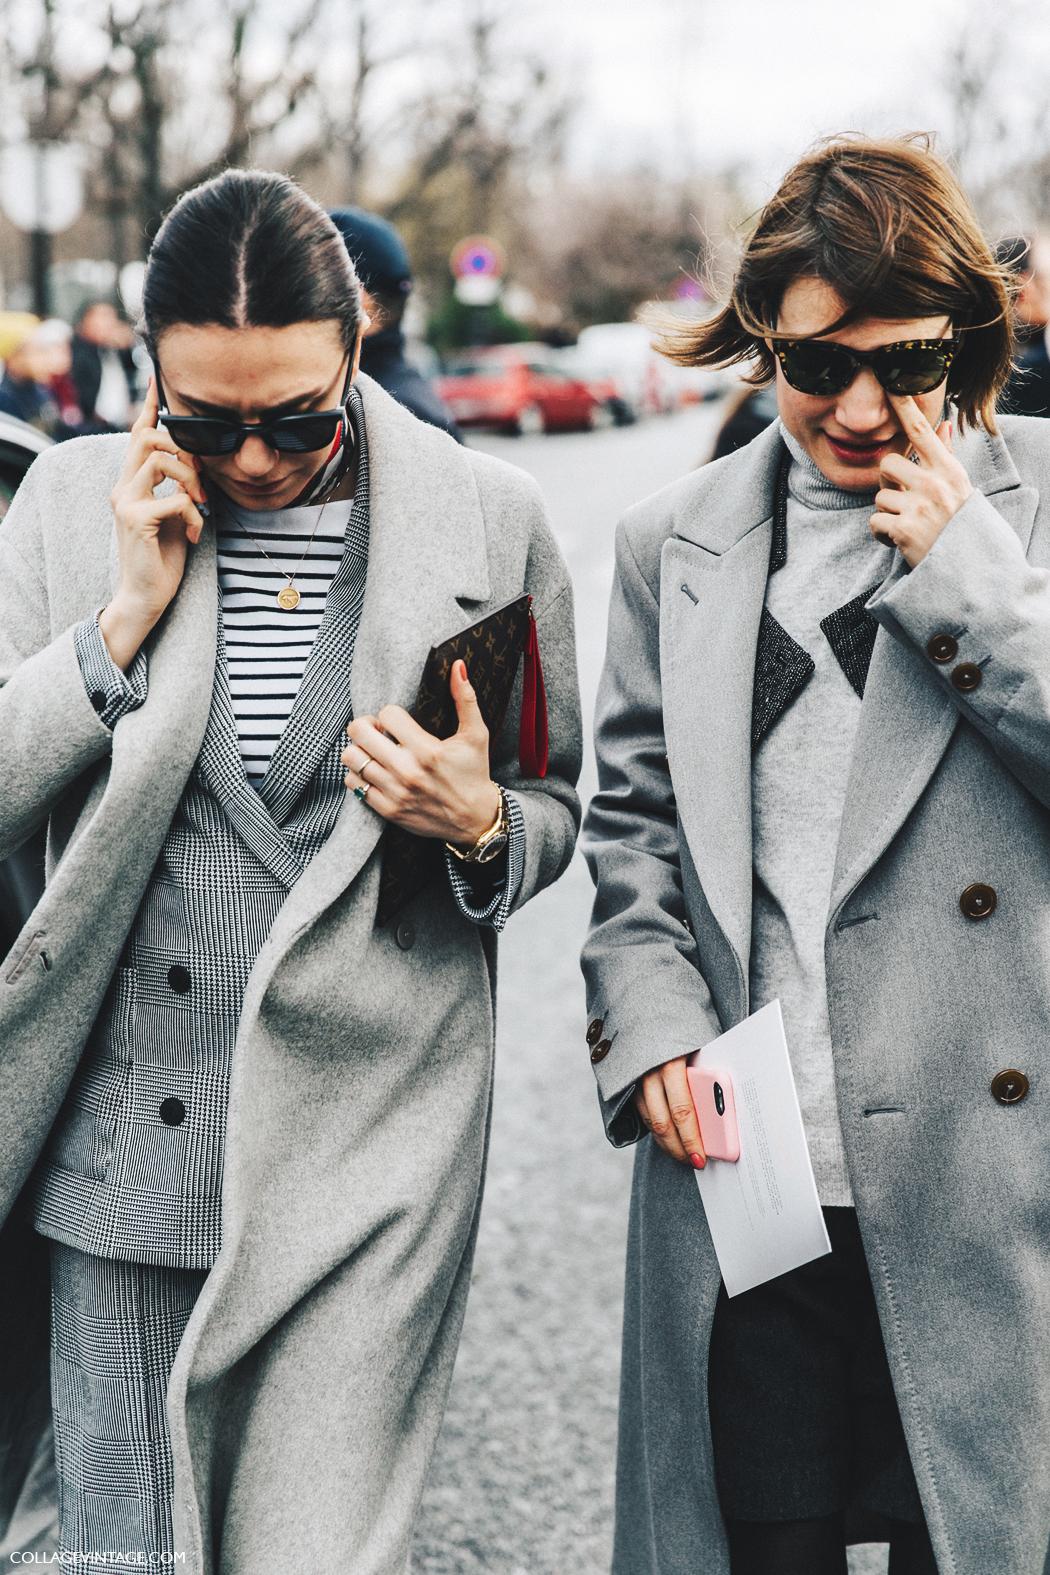 PFW-Paris_Fashion_Week_Fall_2016-Street_Style-Collage_Vintage-Grey_Coats-1